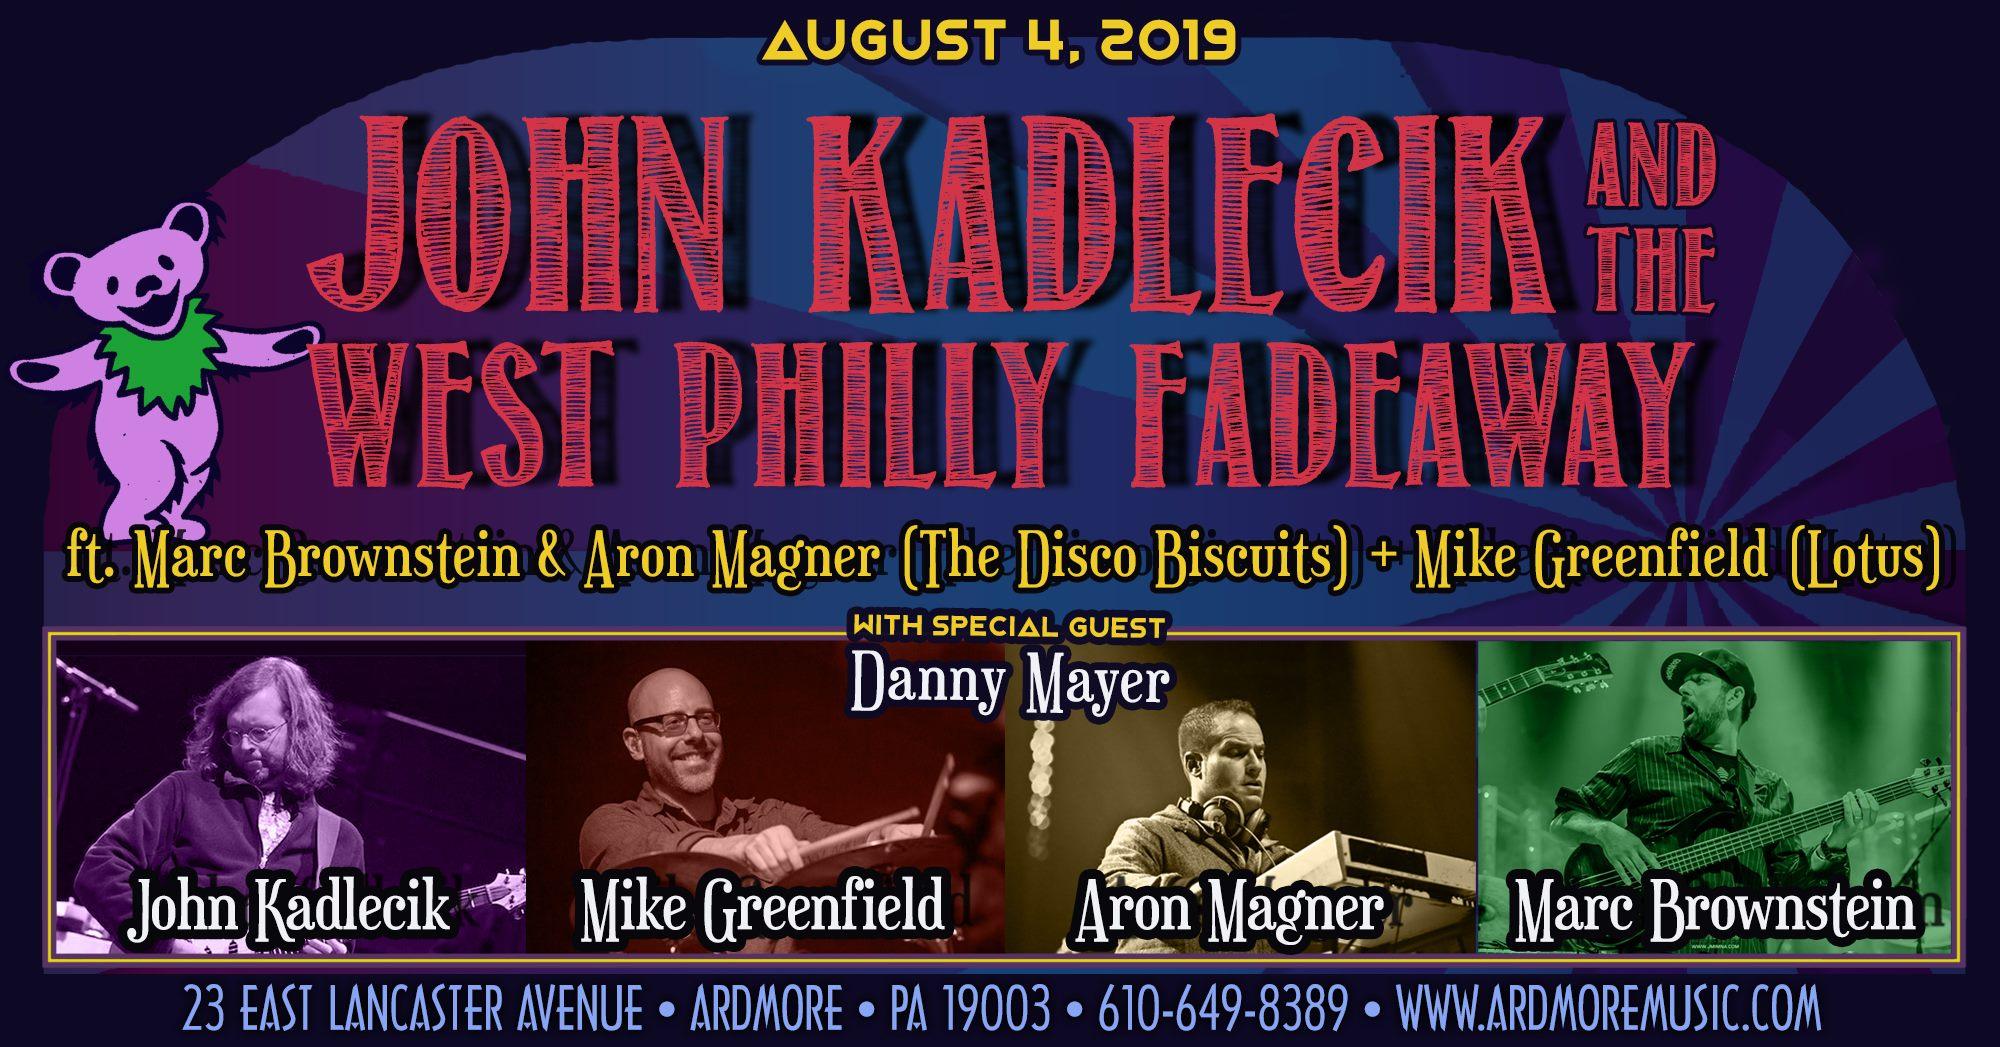 JohnKadlecikAndTheWestPhillyFadeaway2019-08-04ArdmoreMusicHallPA.jpg